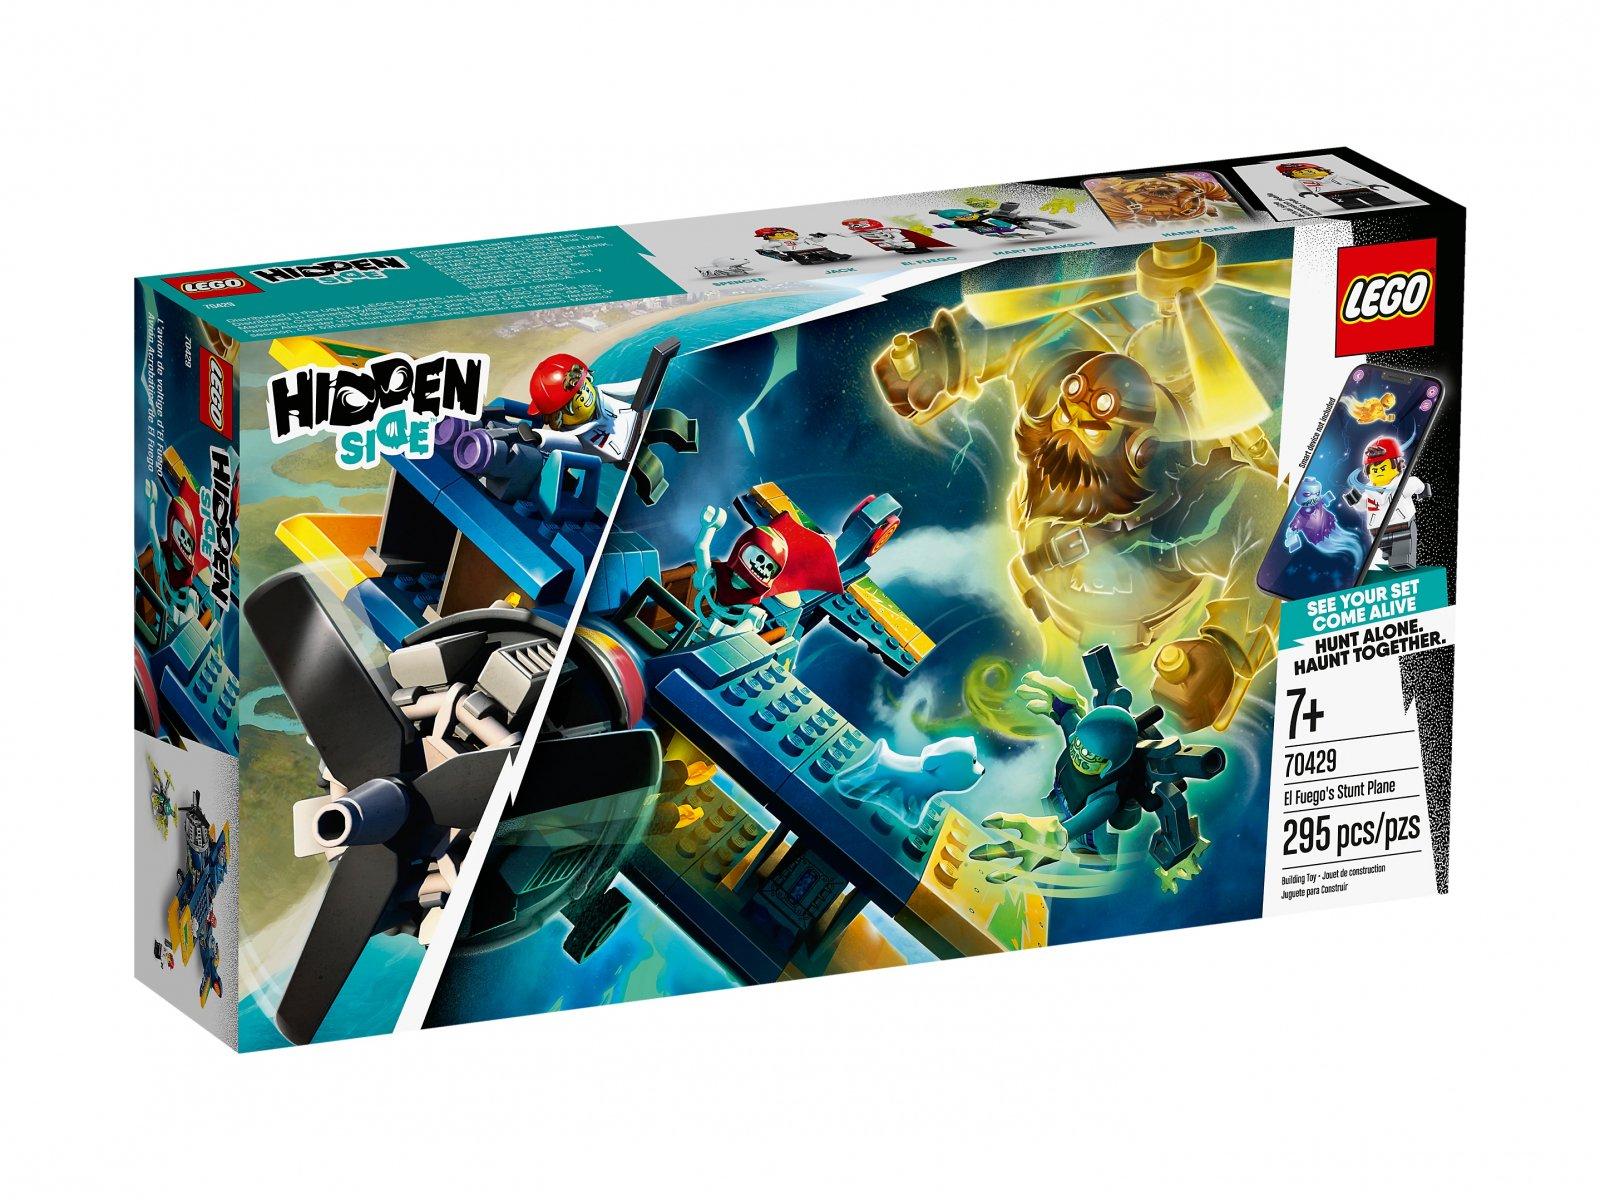 LEGO Hidden Side™ Samolot kaskaderski El Fuego 70429